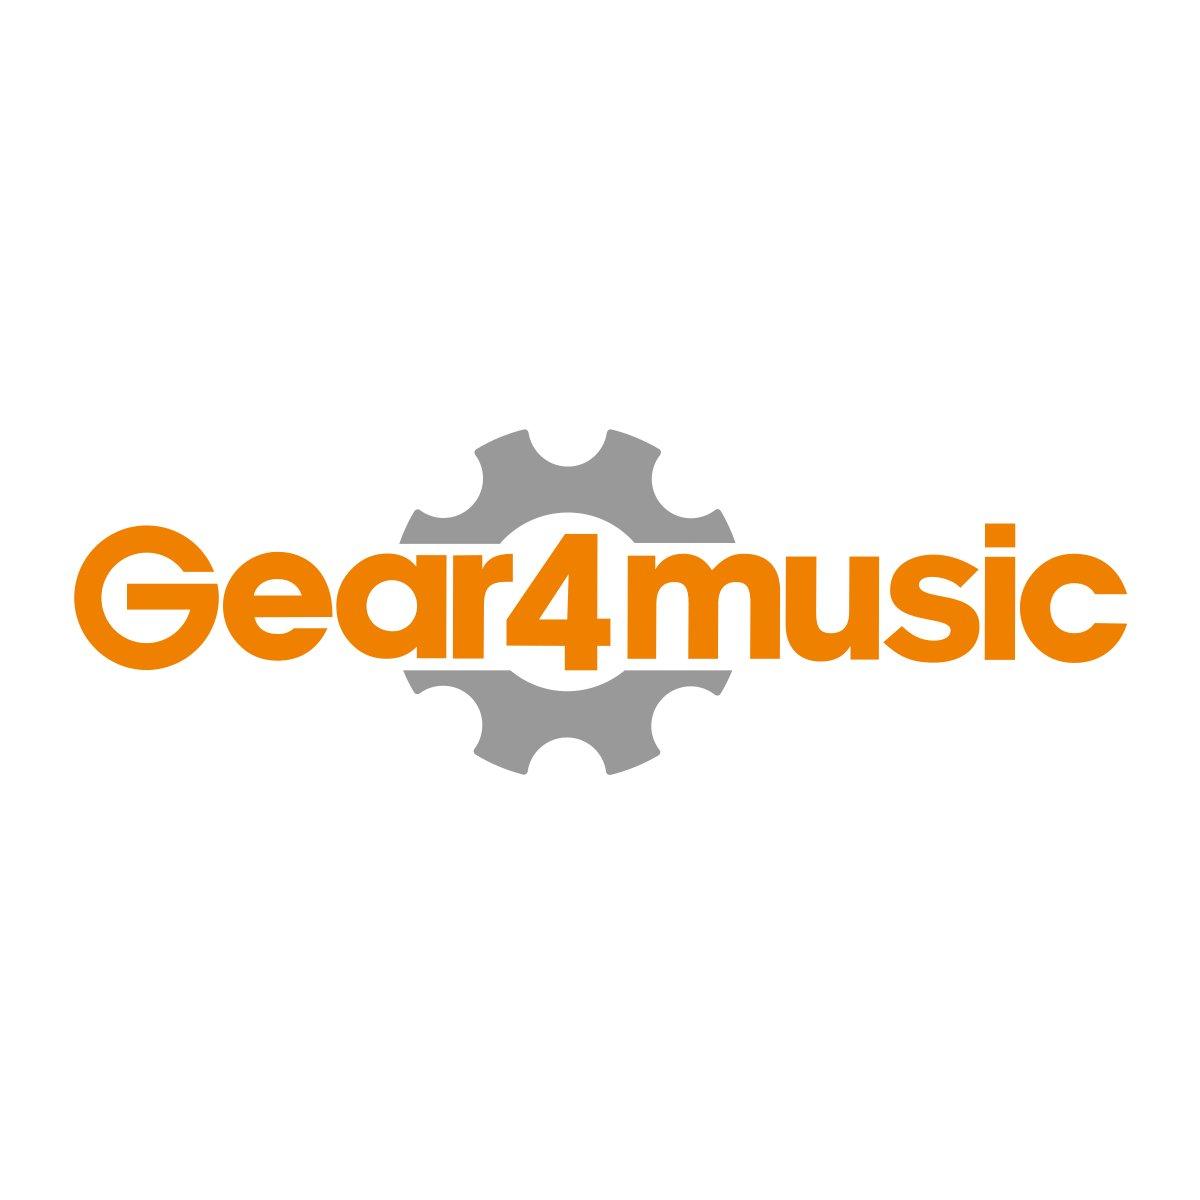 3 Valve Student Euphonium by Gear4music